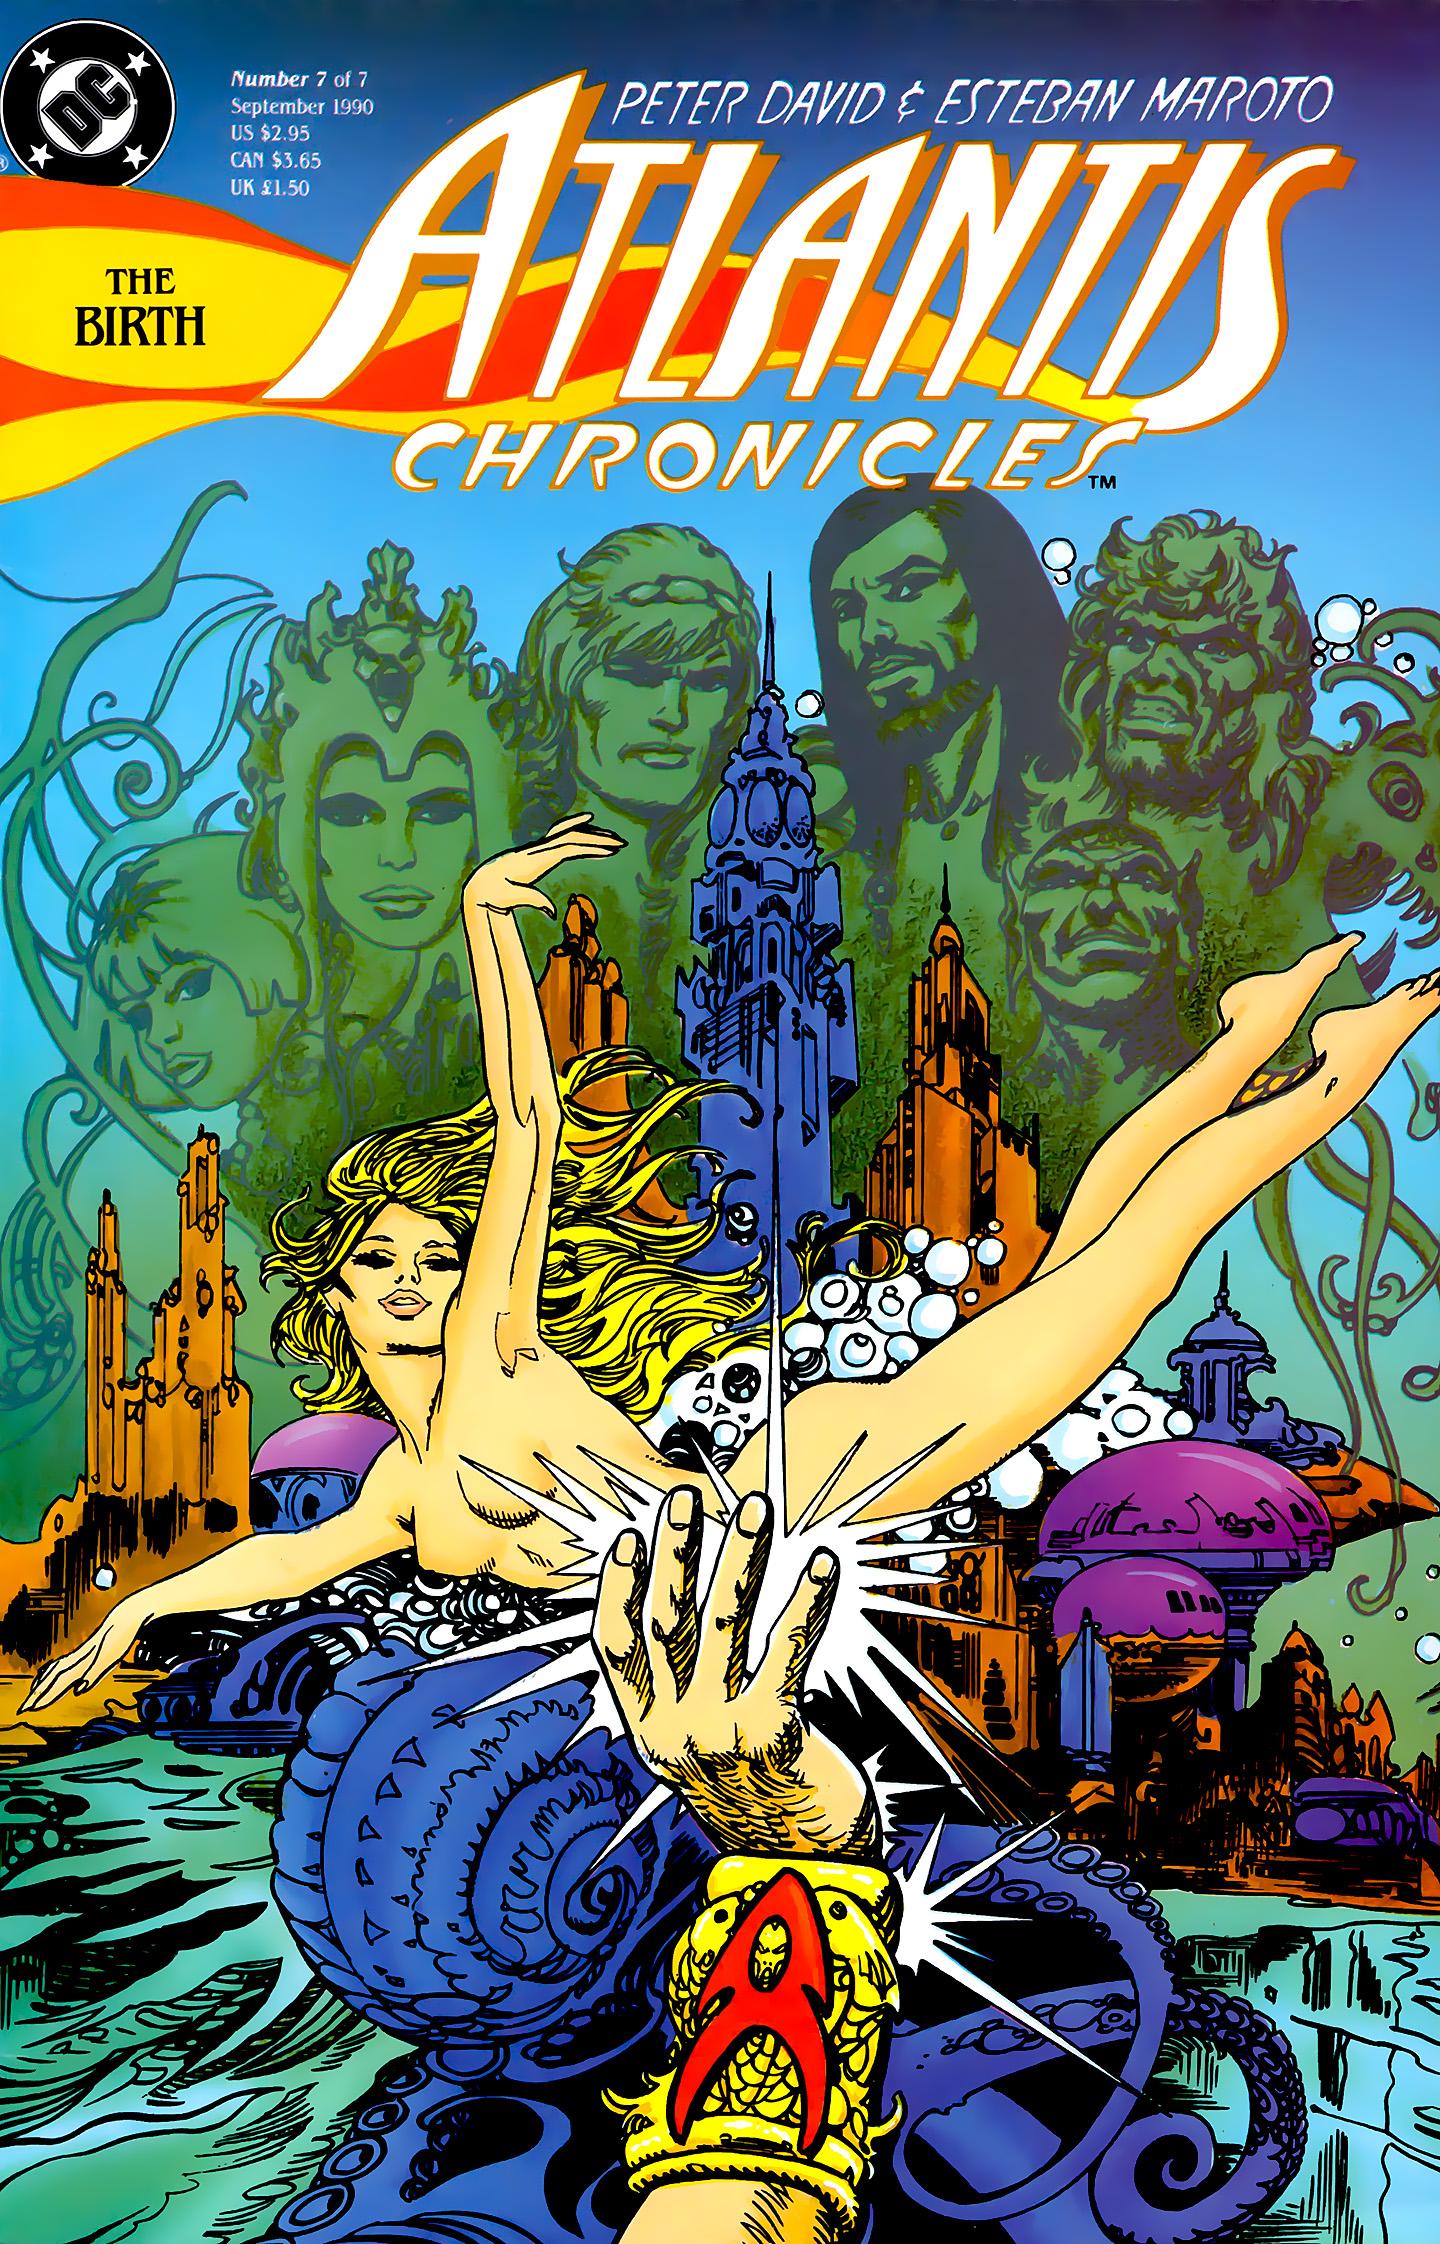 Read online Atlantis Chronicles comic -  Issue #7 - 1